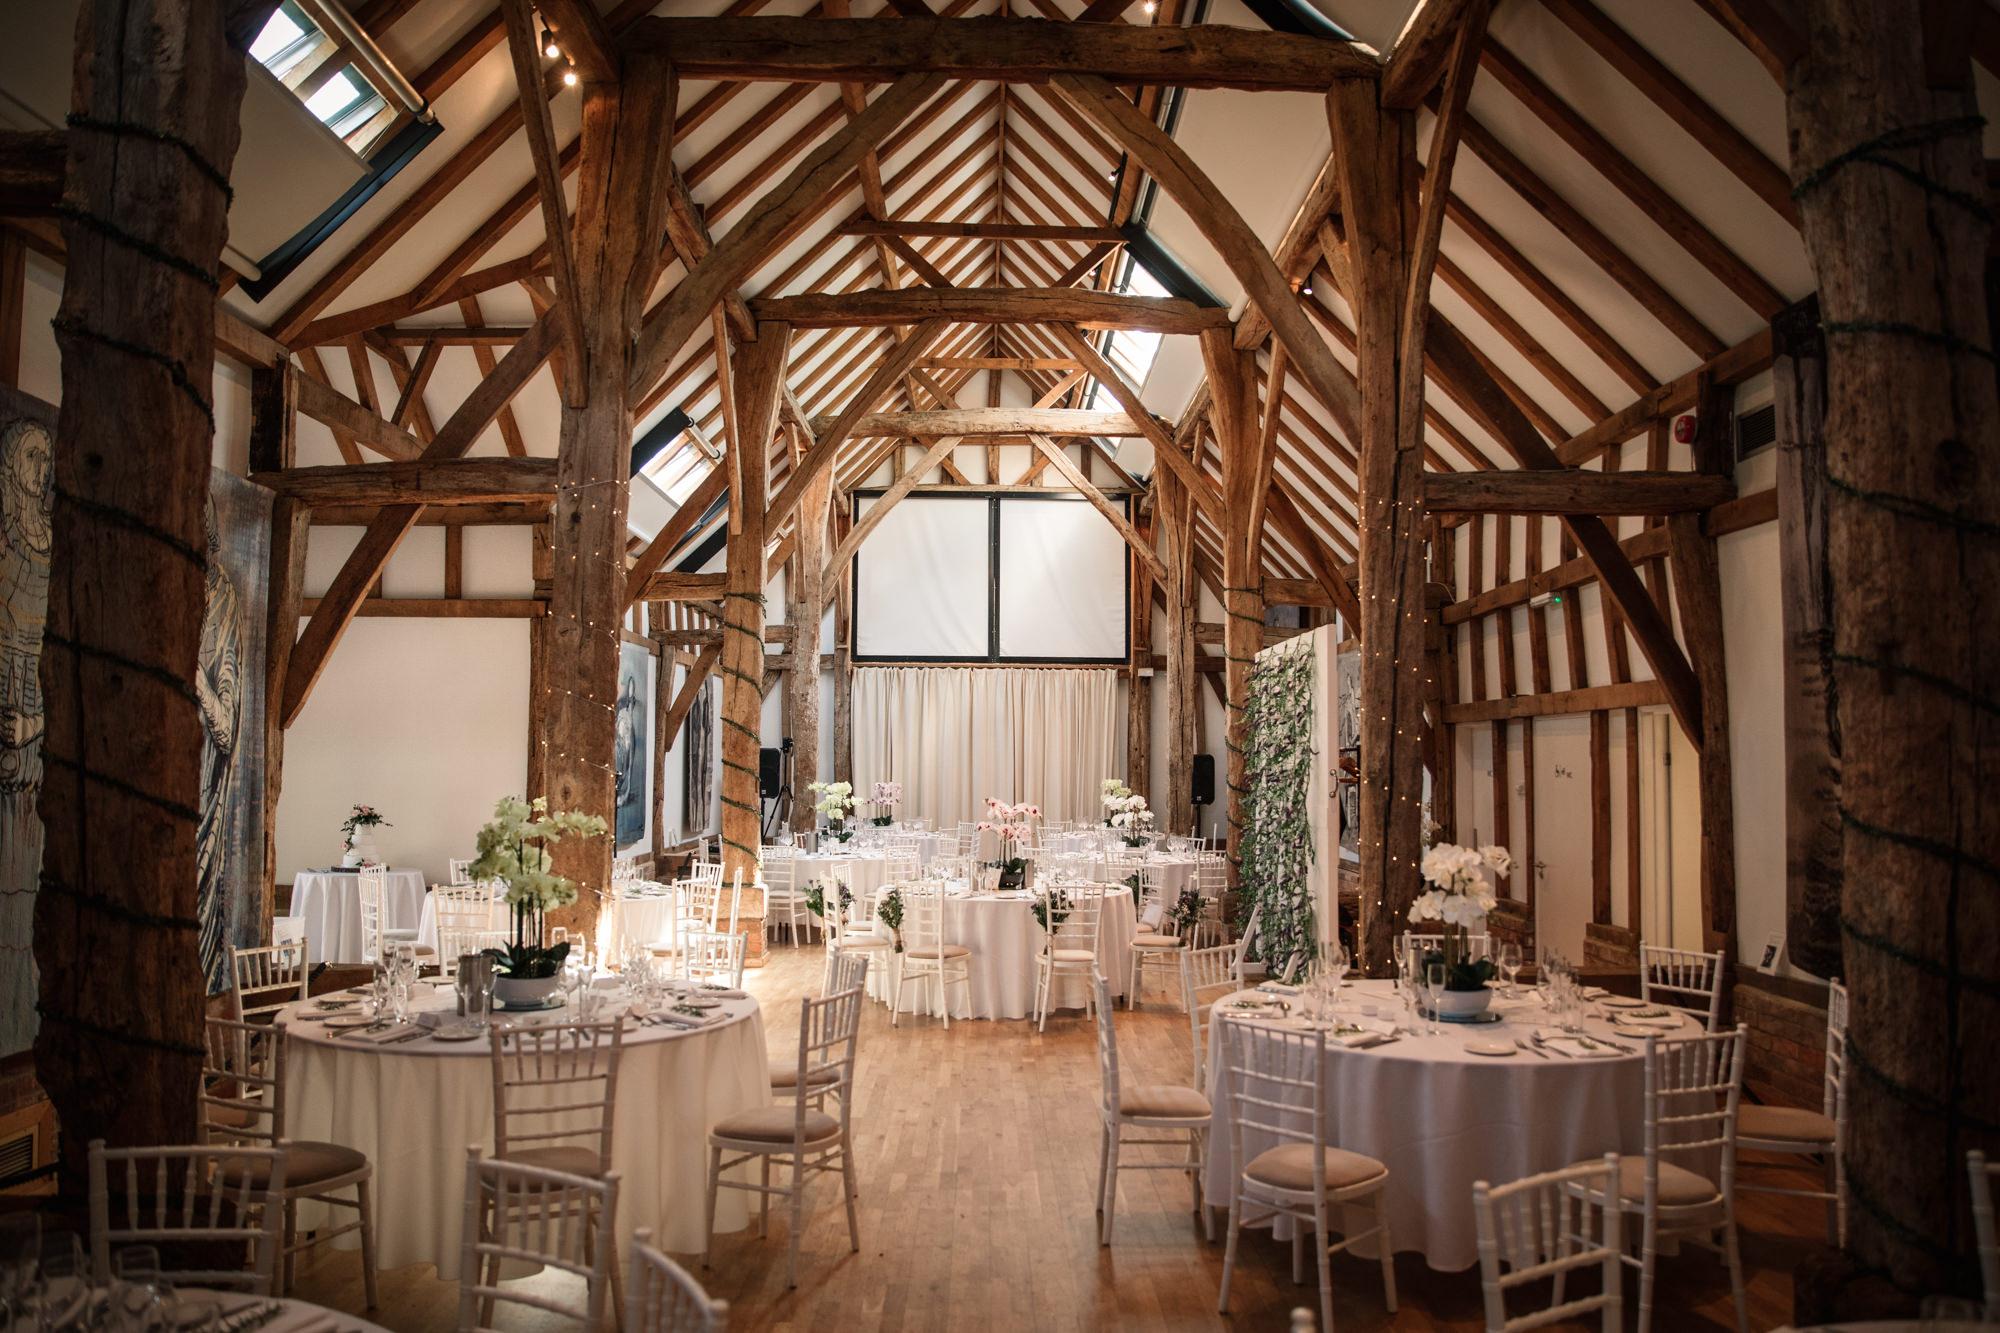 Interior of Henry Moore Studios Aisled Barn